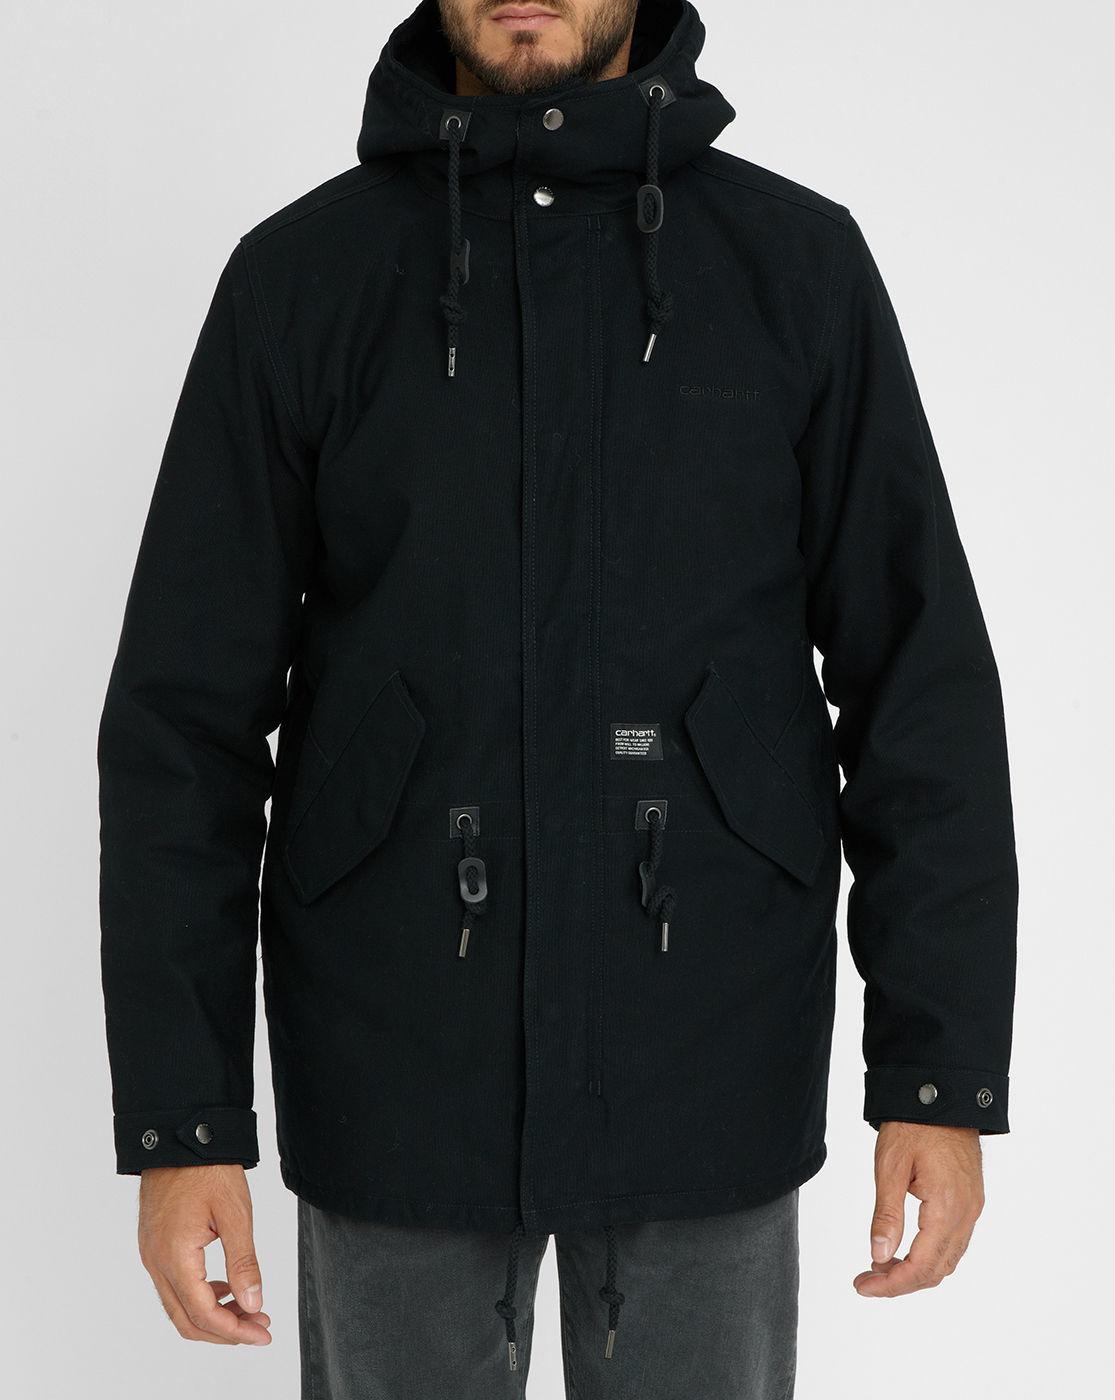 carhartt clash quilted hooded parka in black for men lyst. Black Bedroom Furniture Sets. Home Design Ideas